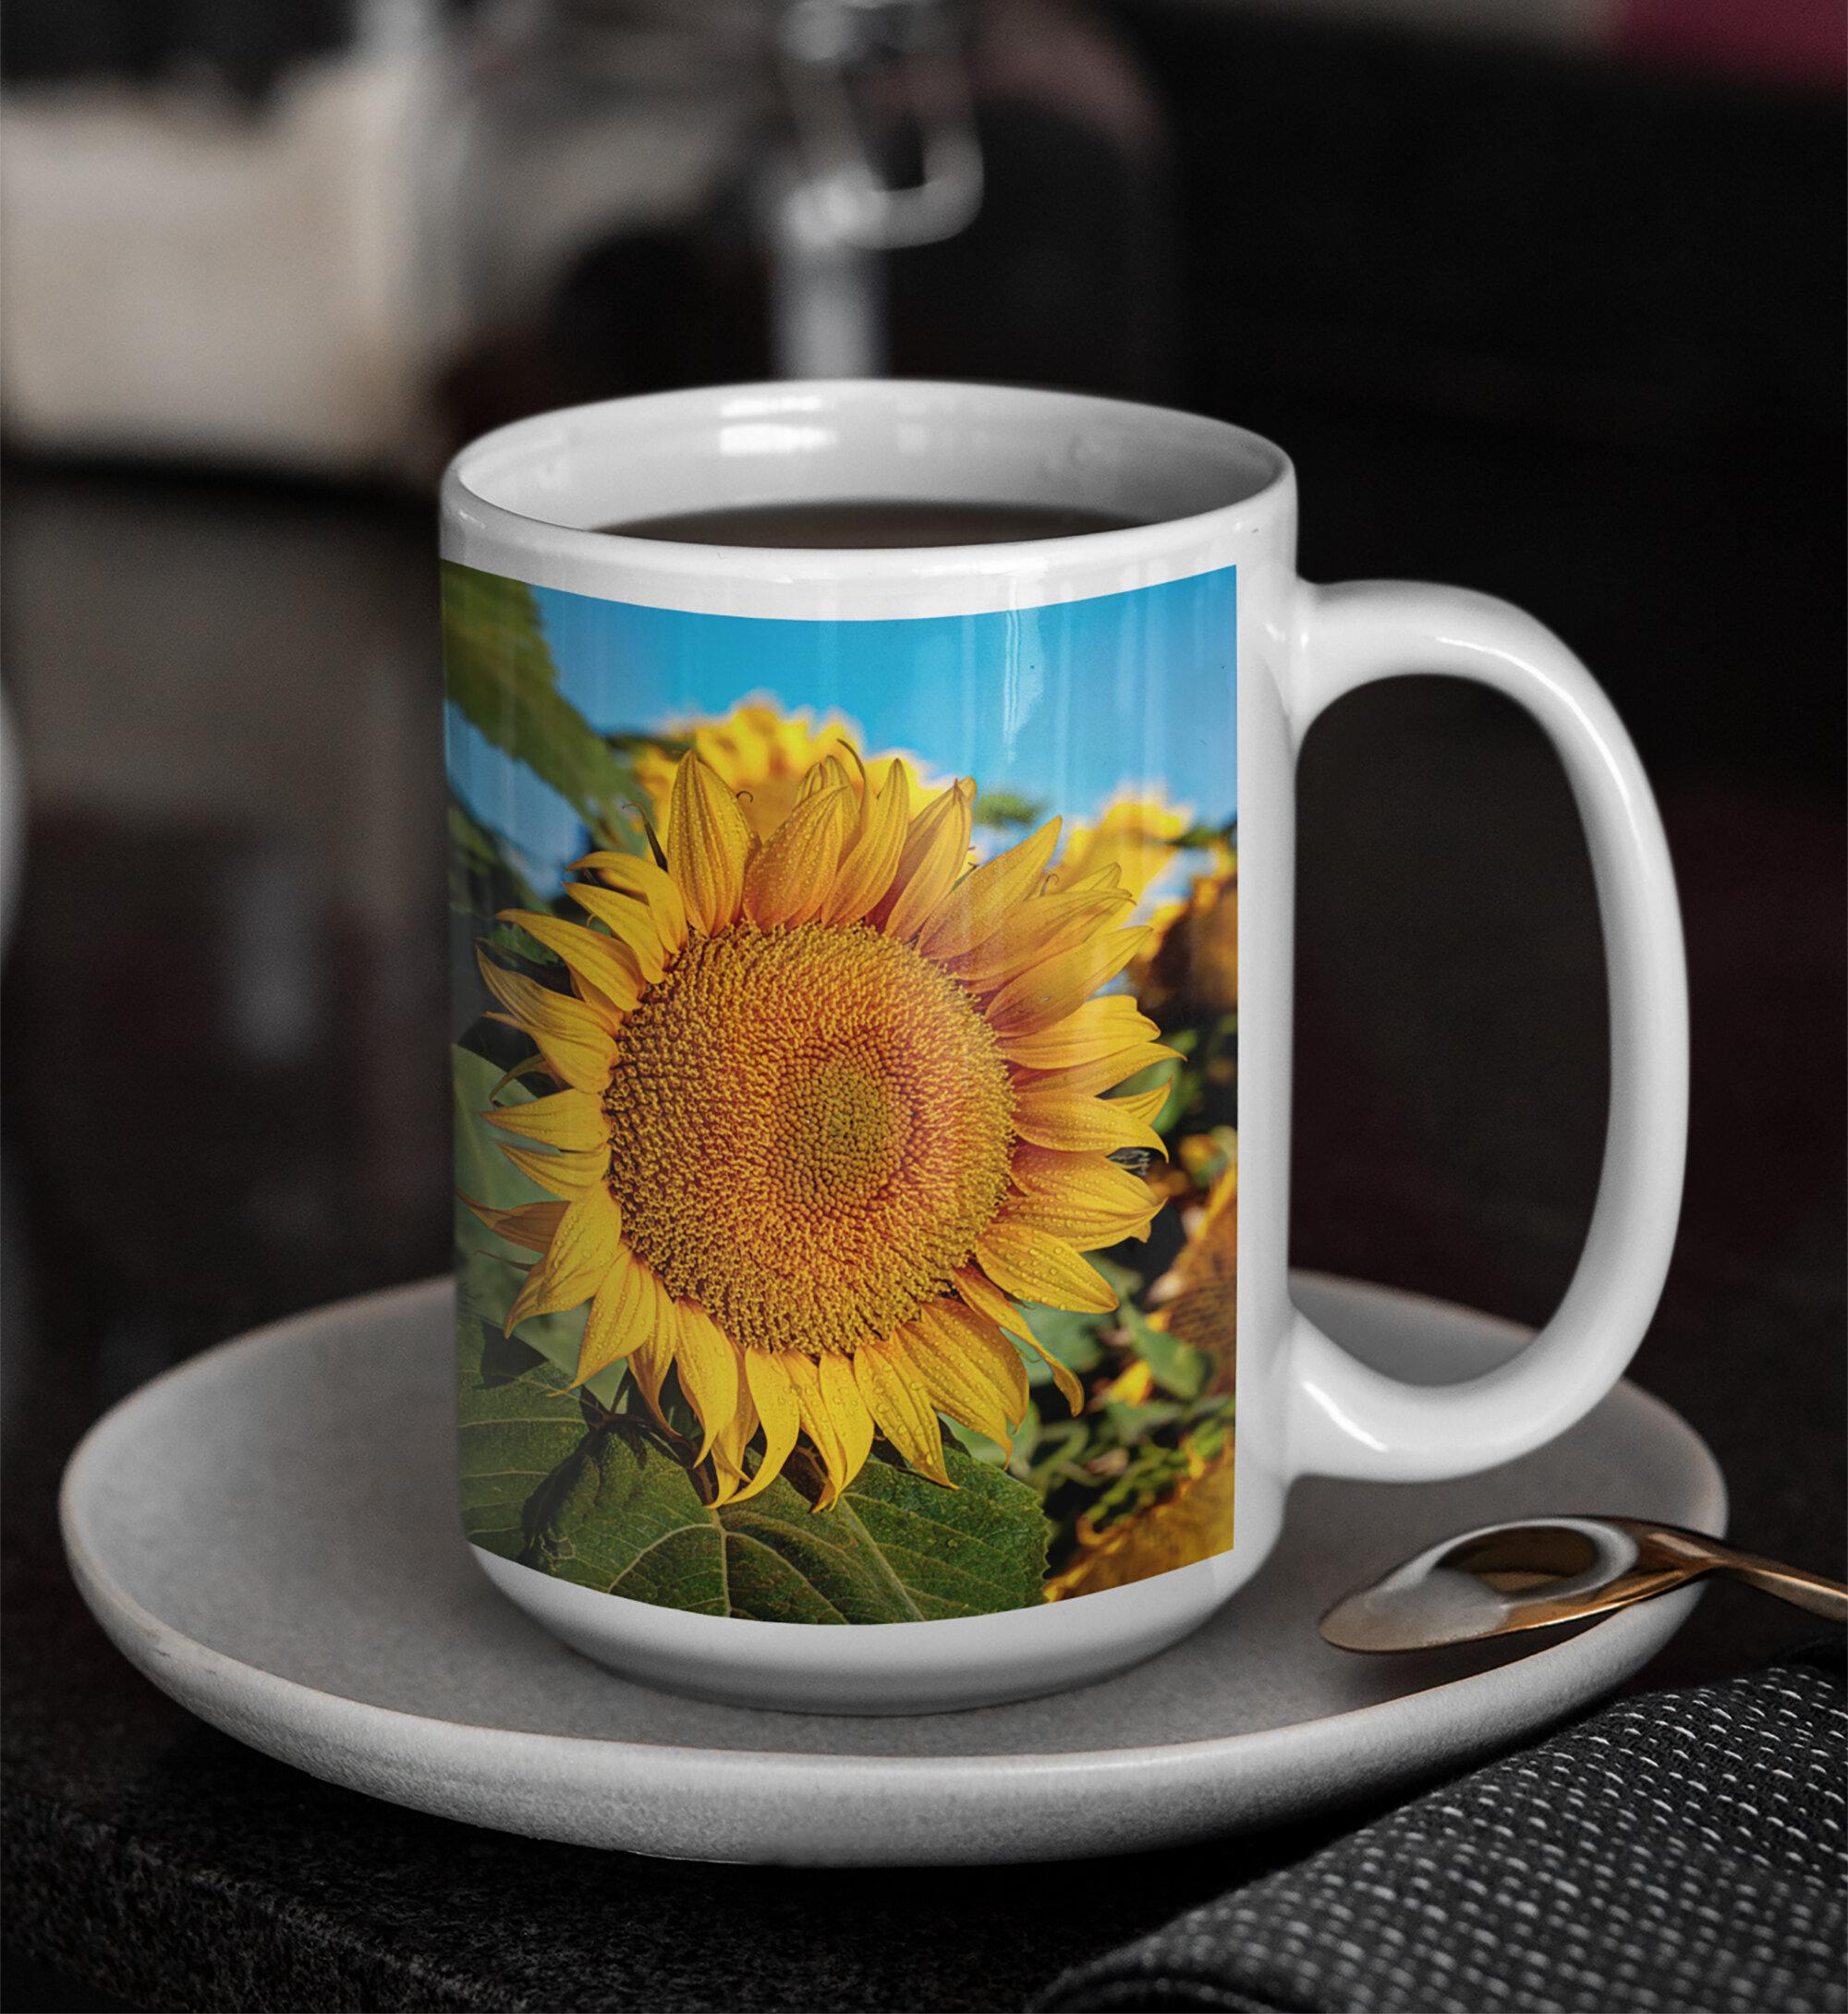 Personalized Sunflower Mug Sunflower Coffee Cup Personalized Mugs Personalized